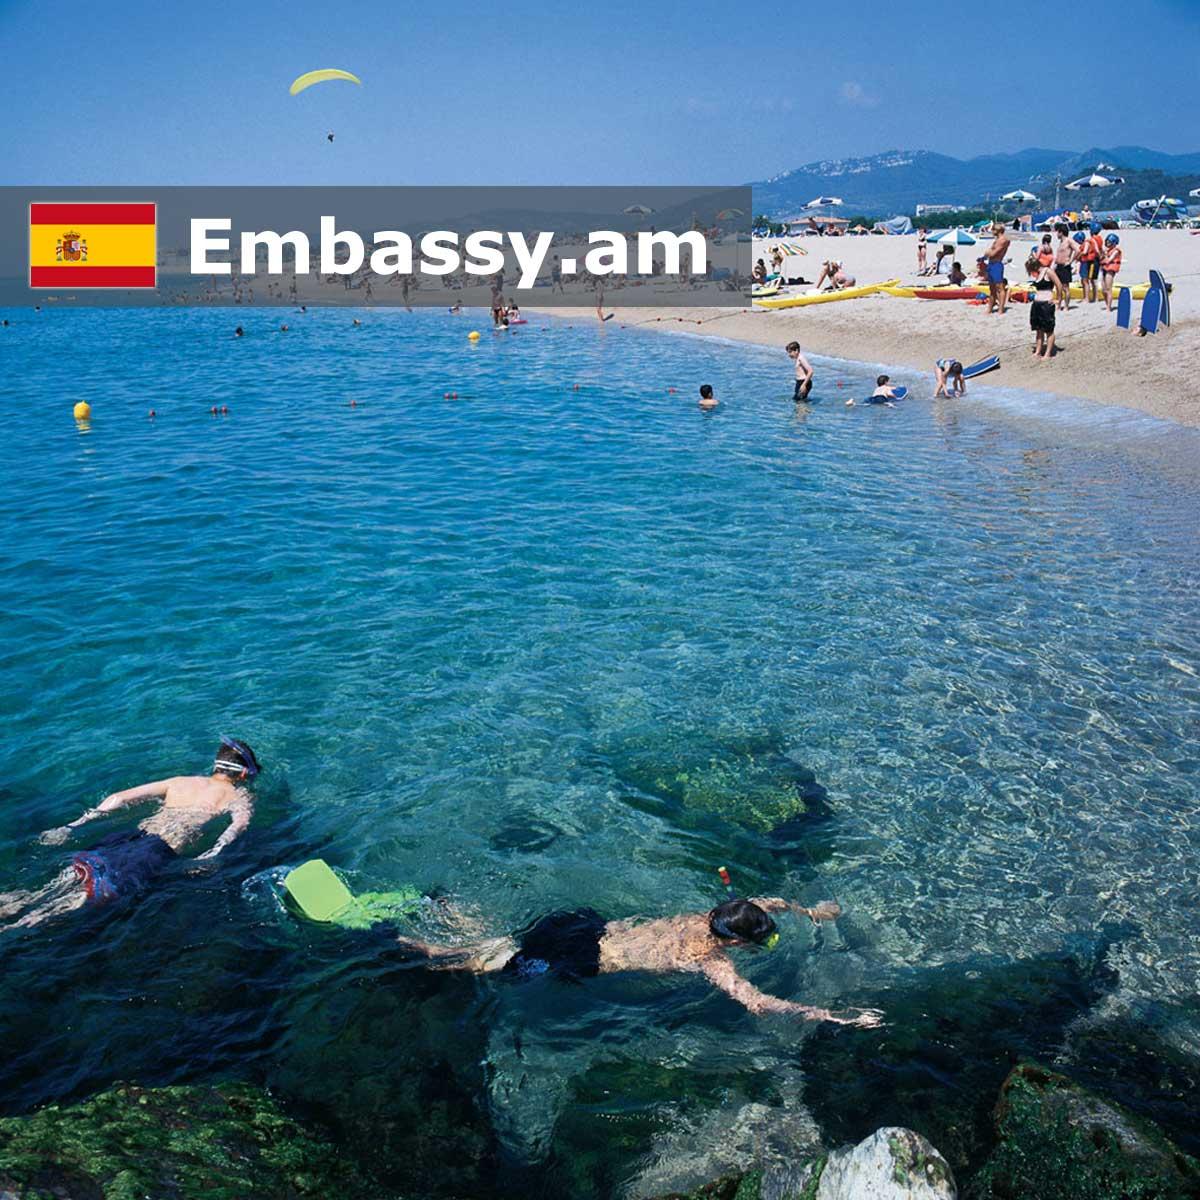 Santa Susanna - Hotels in Spain - Embassy.am